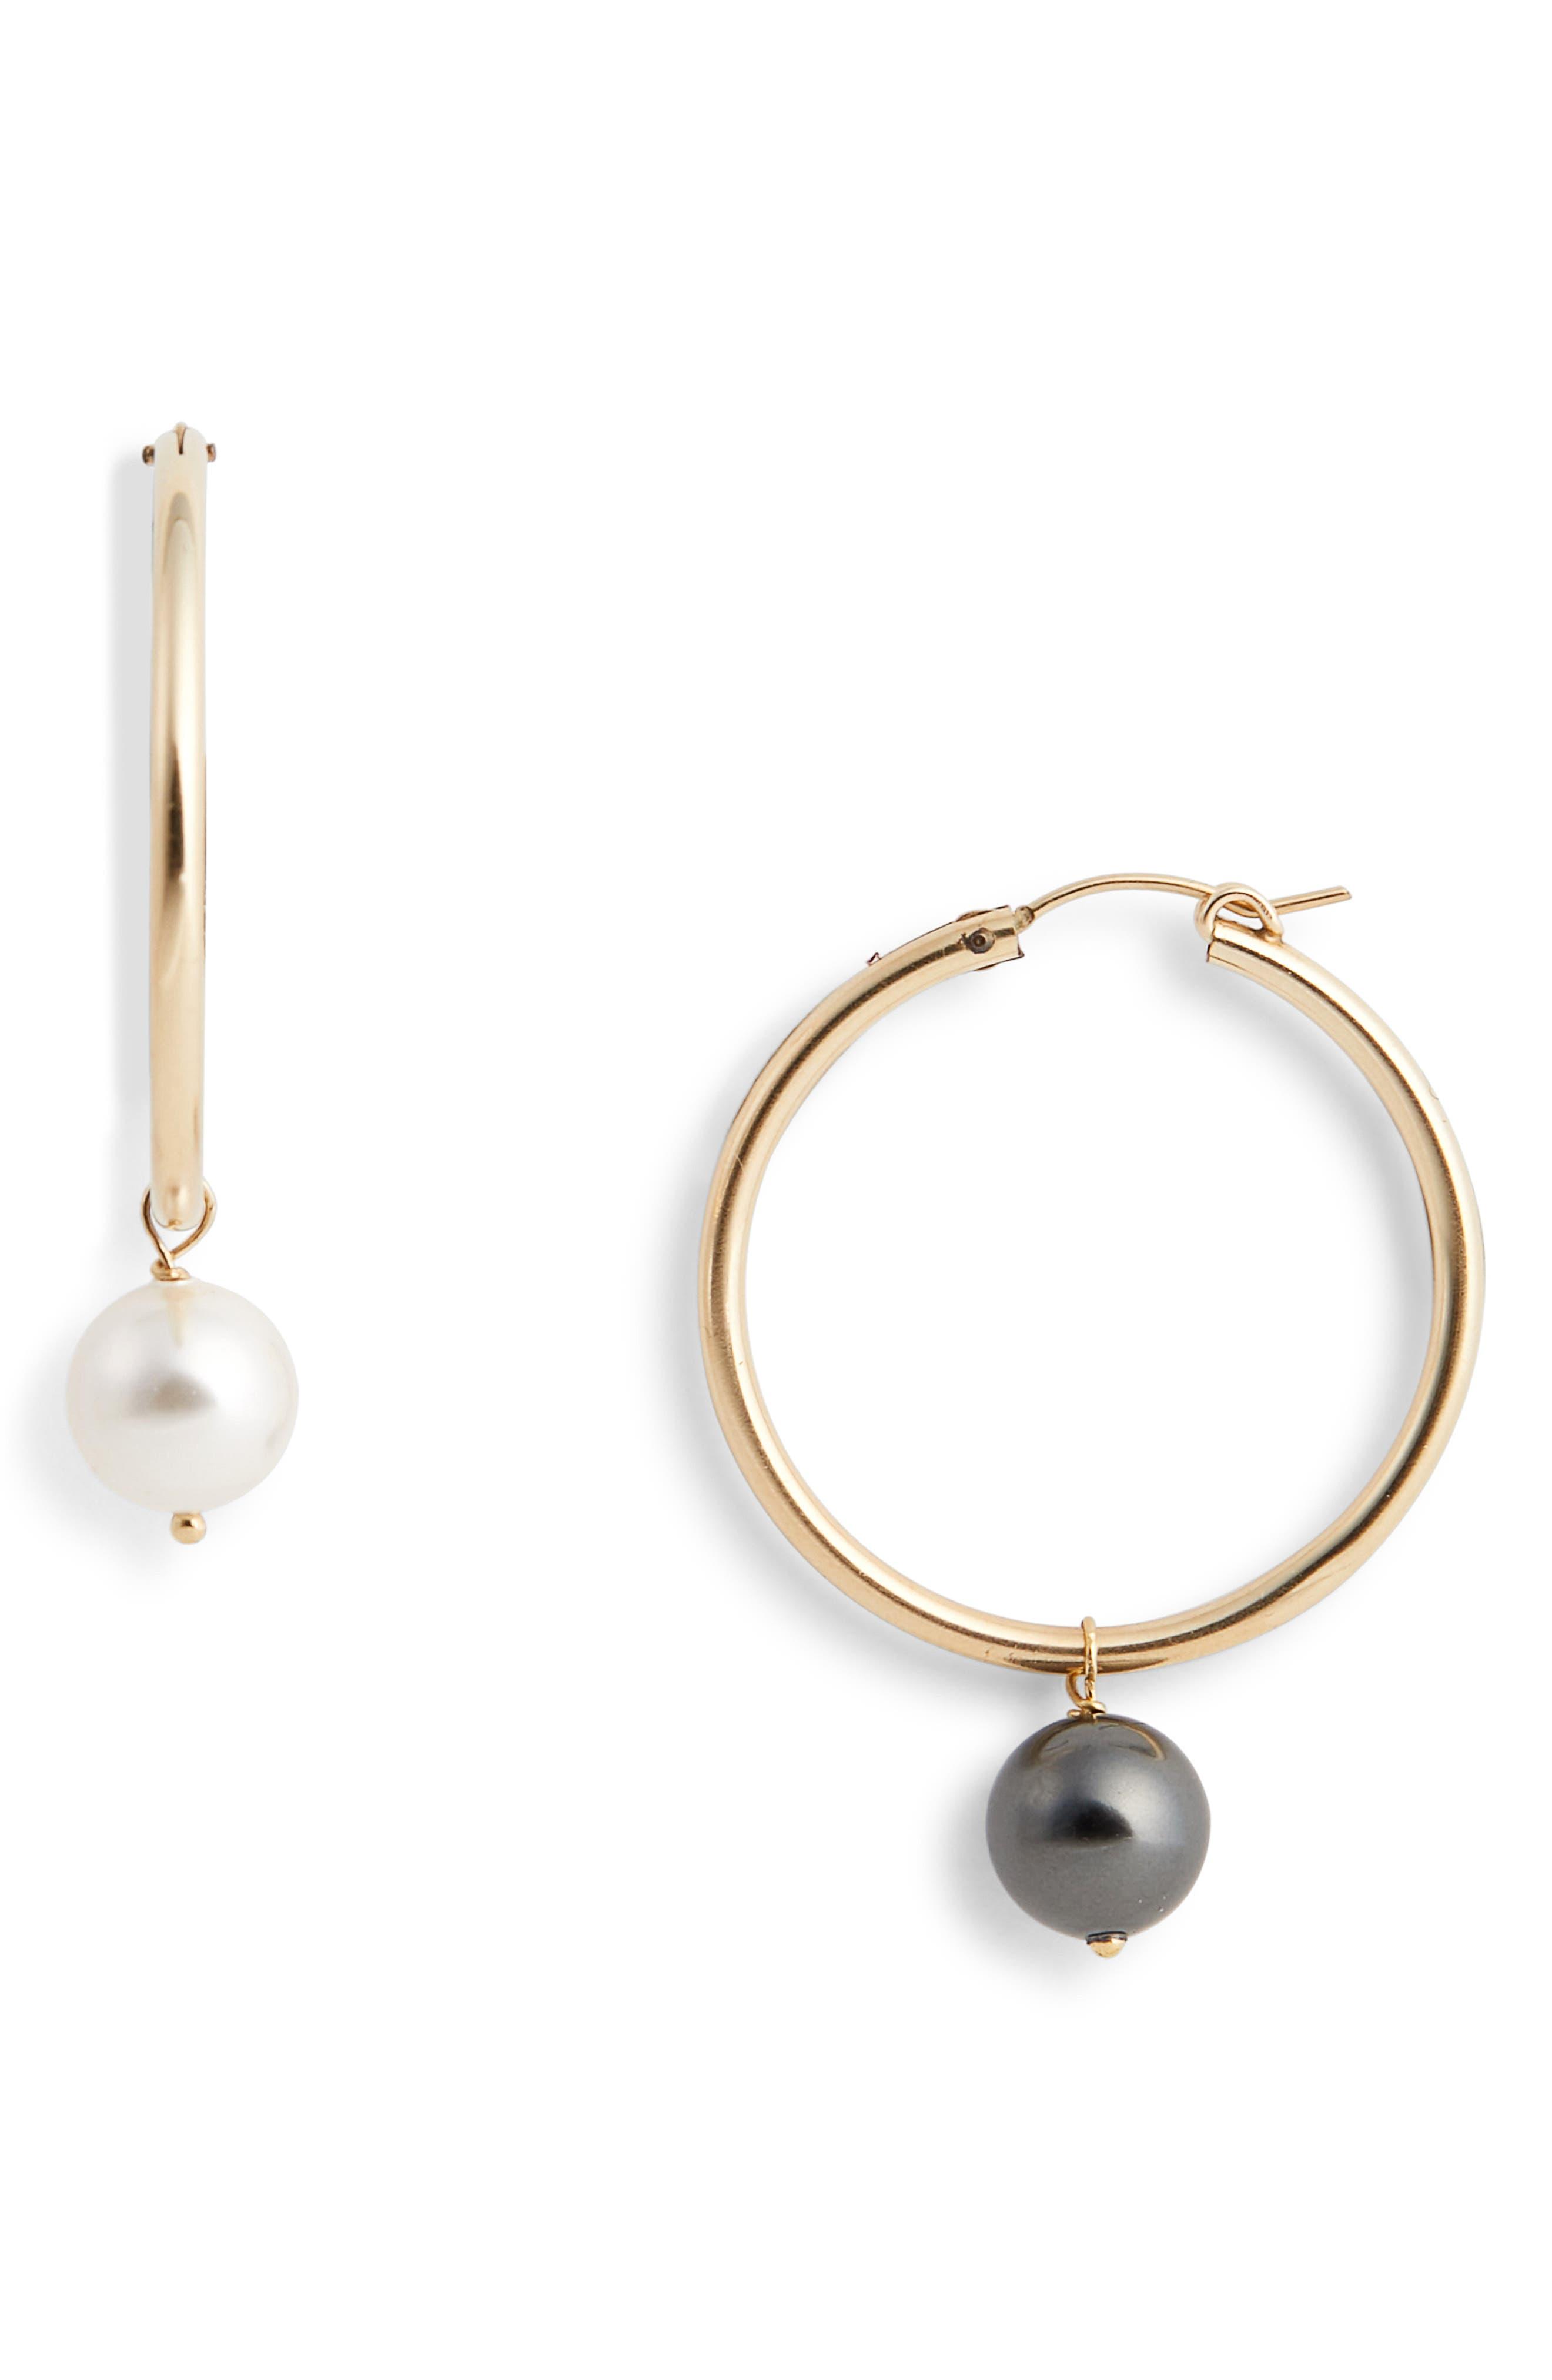 Agra Mismatched Swarovski Imitation Pearl Hoop Earrings,                             Main thumbnail 1, color,                             WHITE PEARL BLACK PEARL